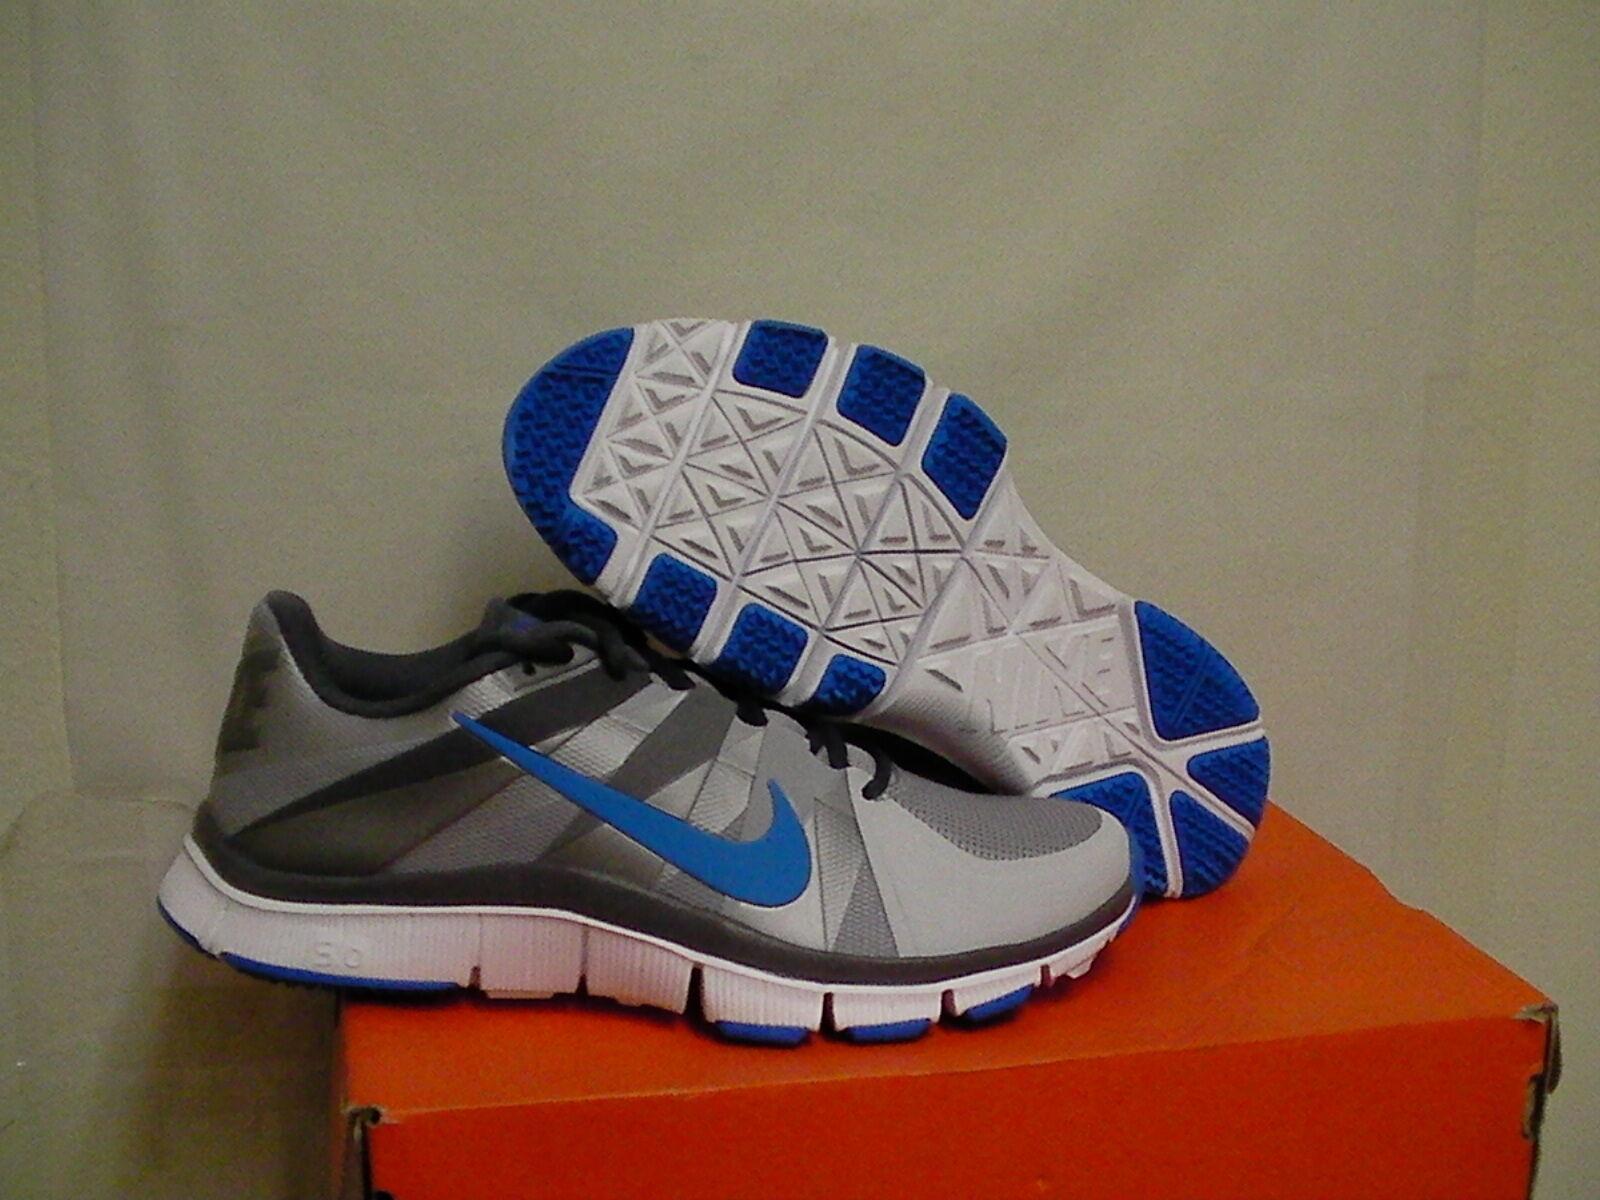 Mens Nike free trainer 5.0 Größe 7.5 us men grau,Blau new with box